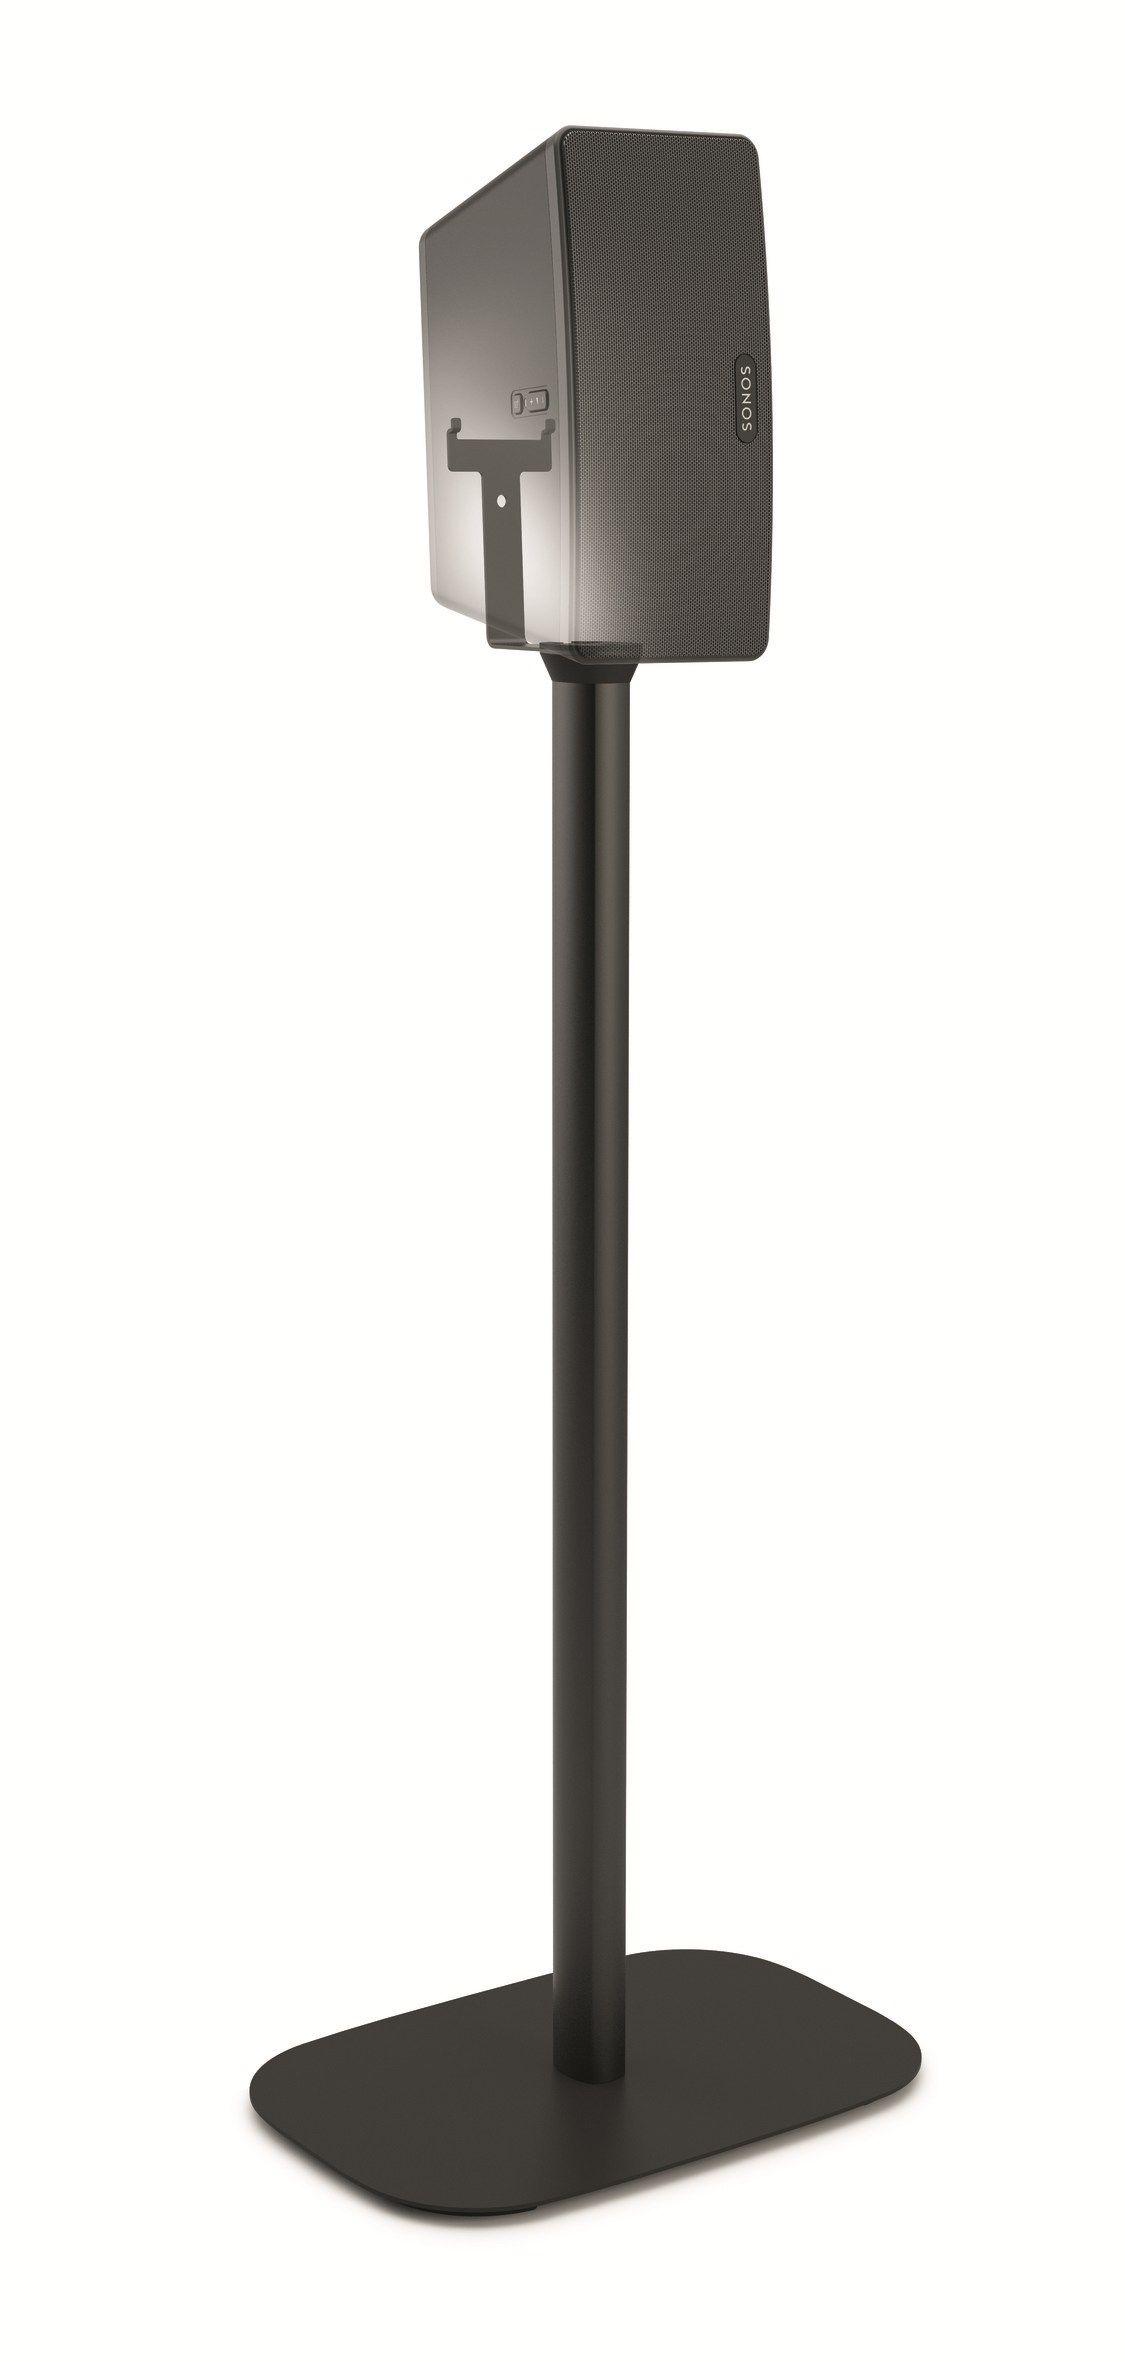 speaker stand sonos play 3 by vogel 39 s exhibo. Black Bedroom Furniture Sets. Home Design Ideas